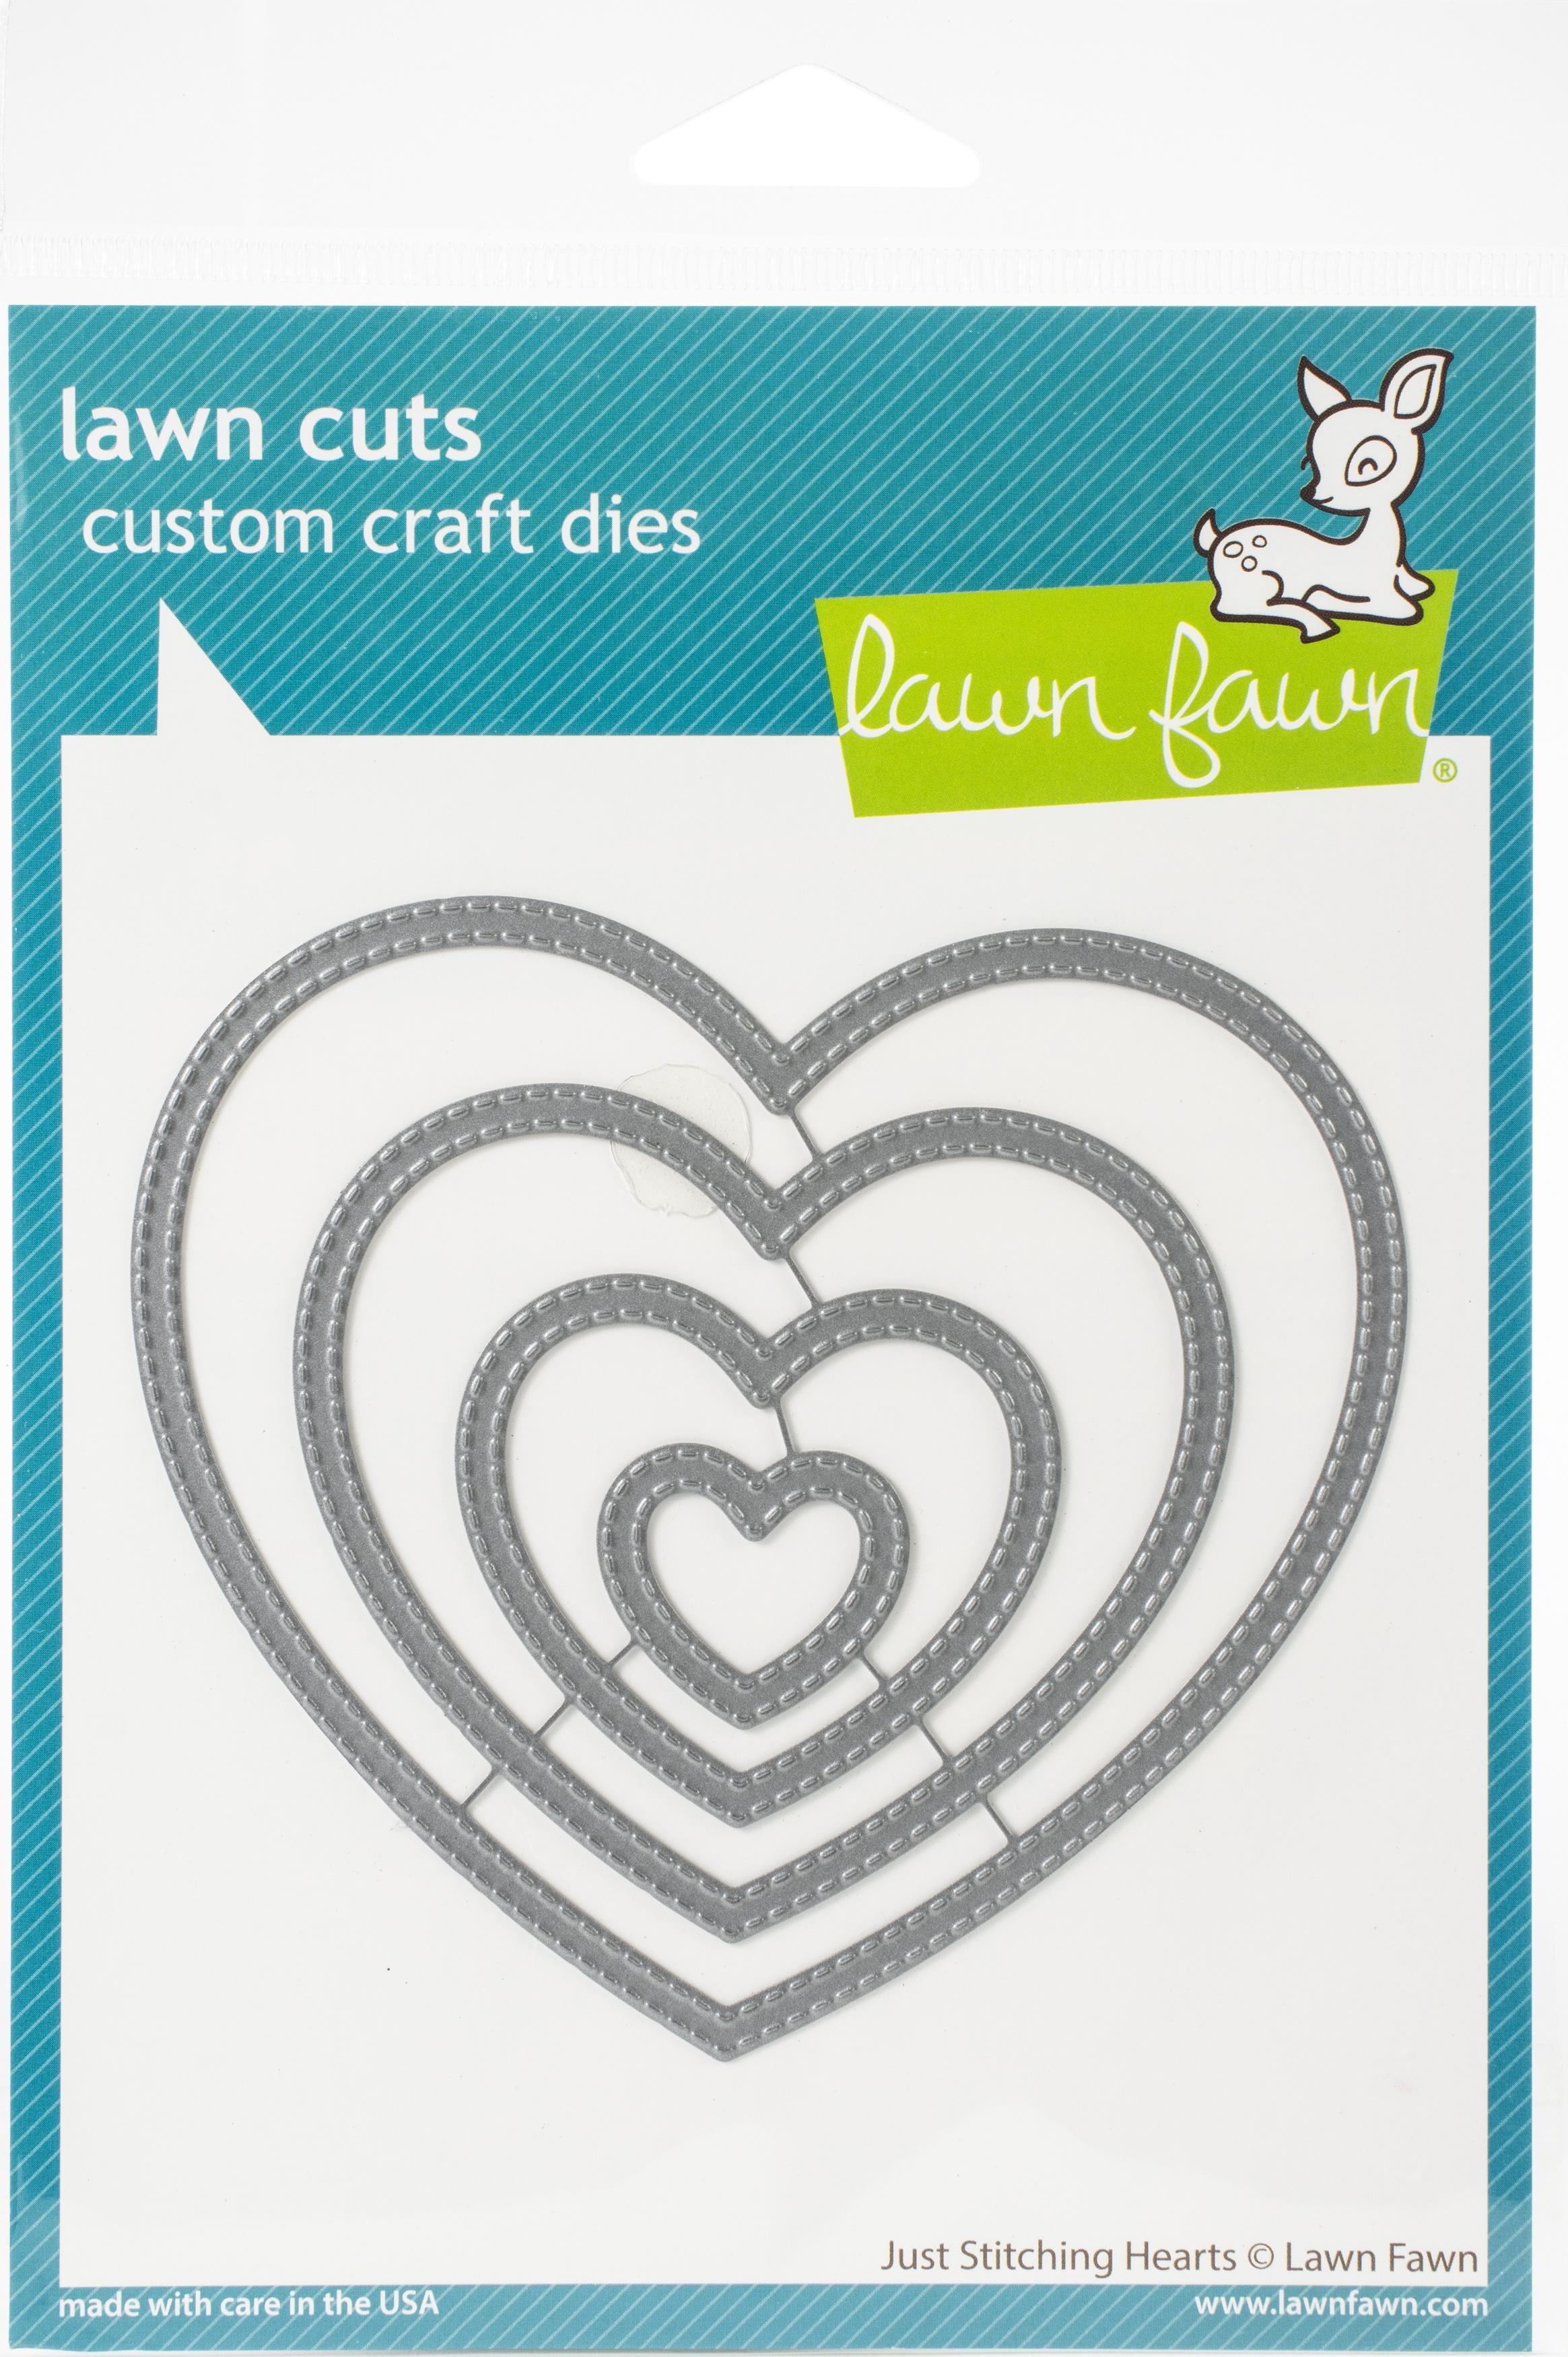 Lawn Cuts Custom Craft Die -Just Stitching Hearts